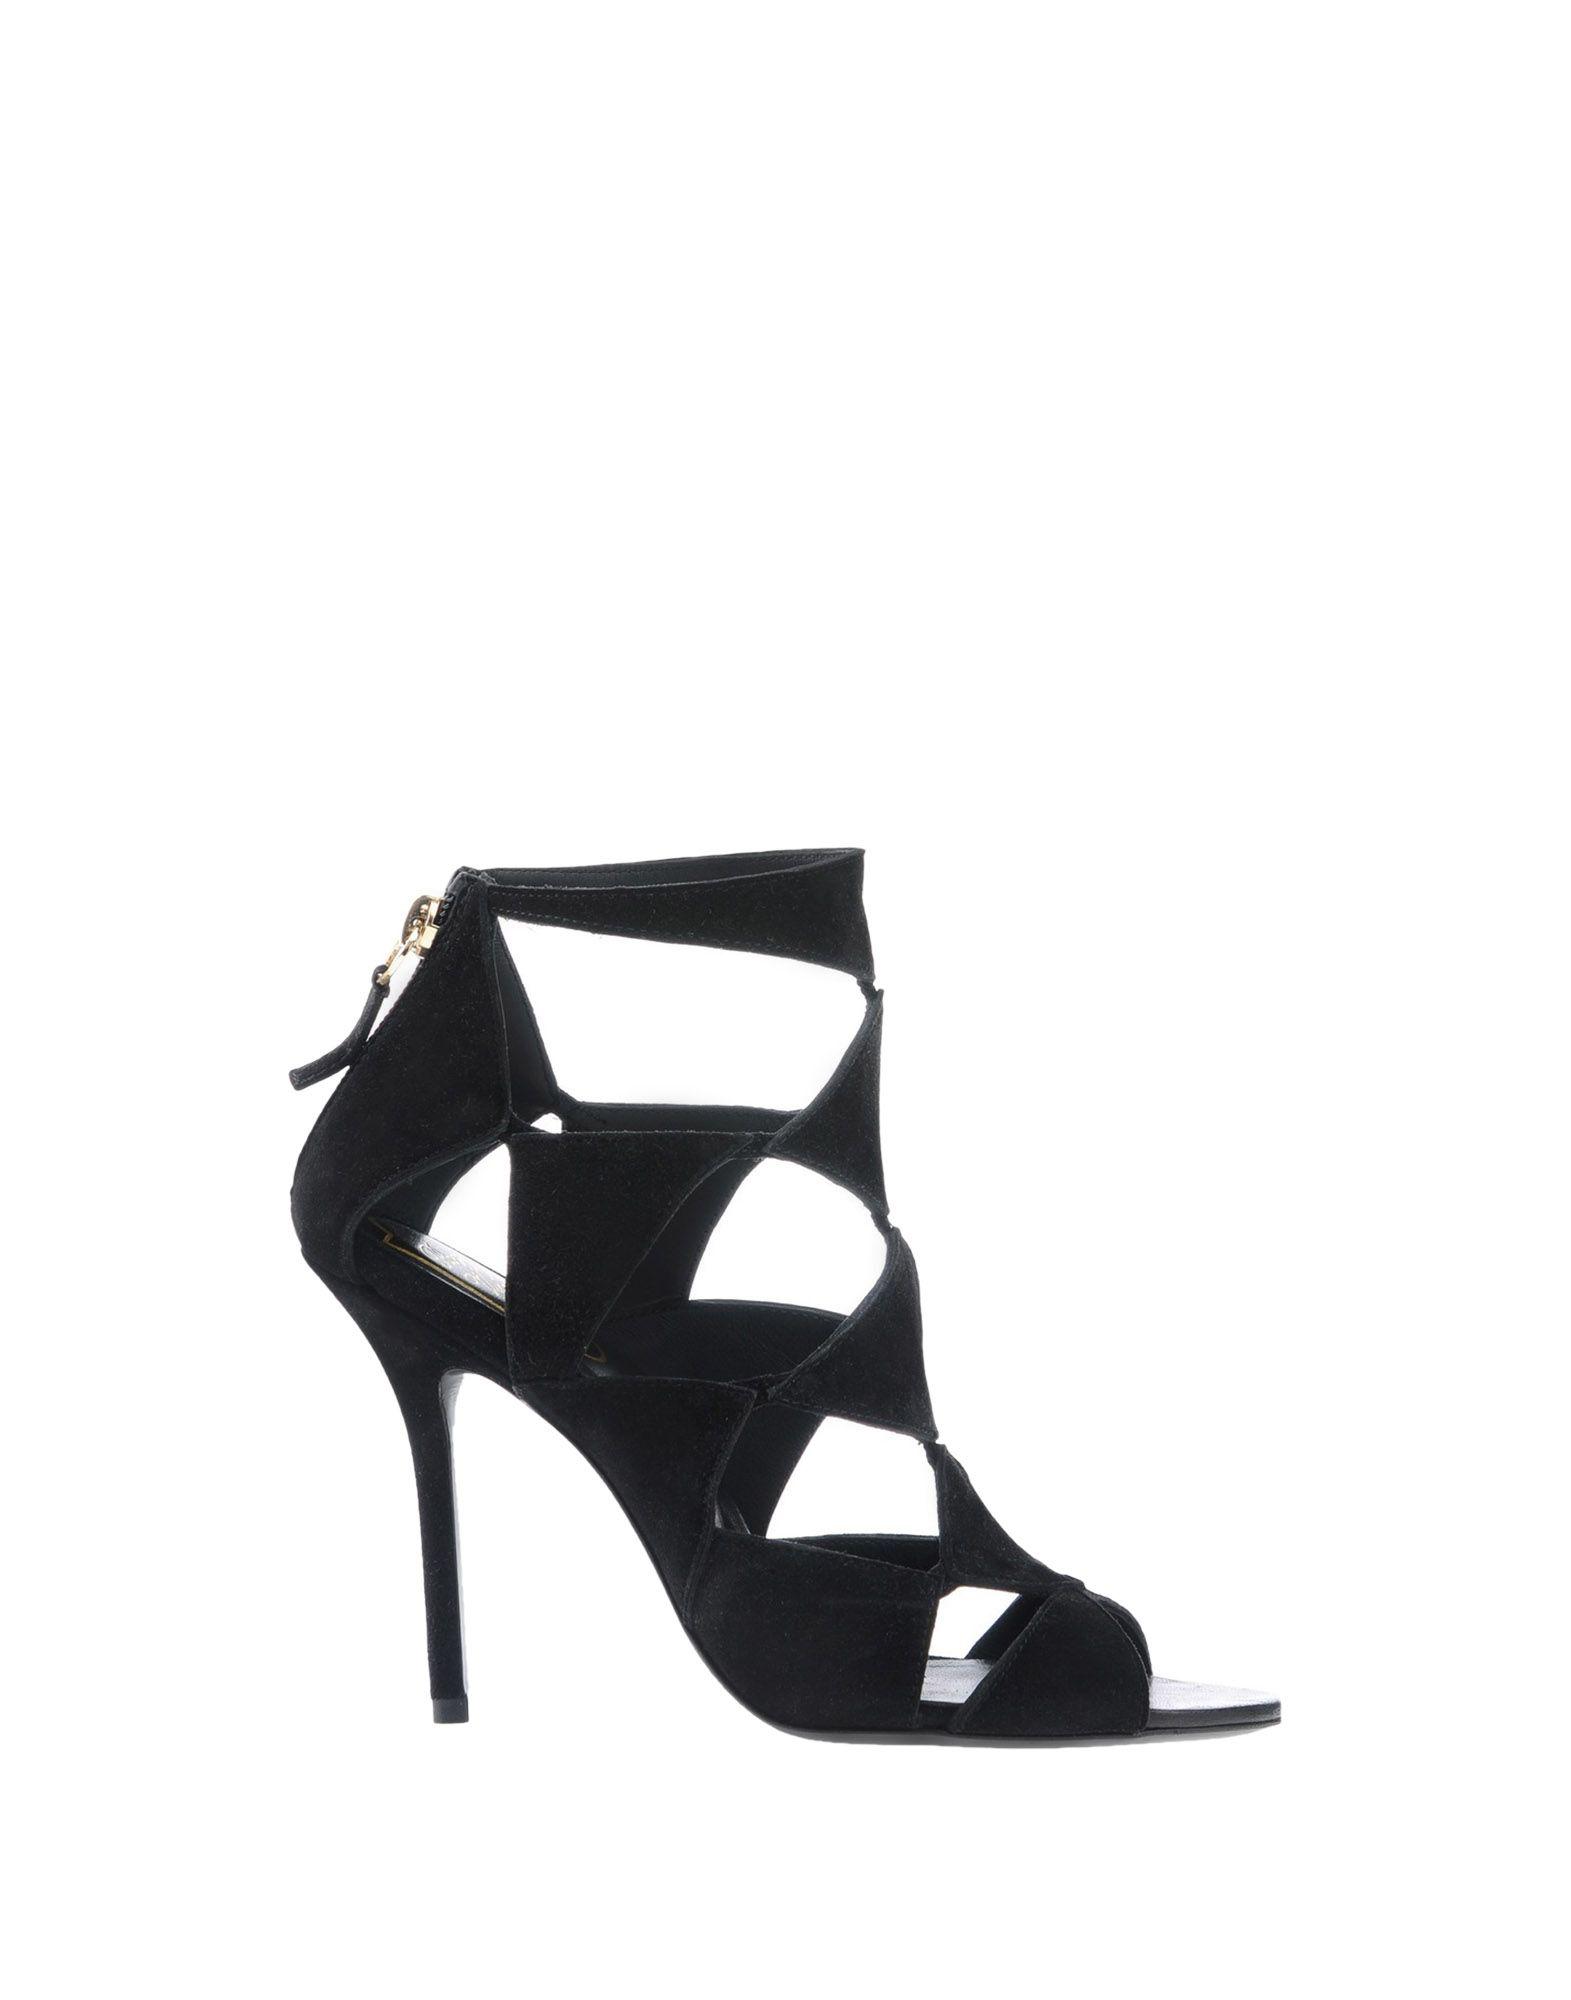 Roger Vivier gut Sandalen Damen  11306989RUGünstige gut Vivier aussehende Schuhe 574e21